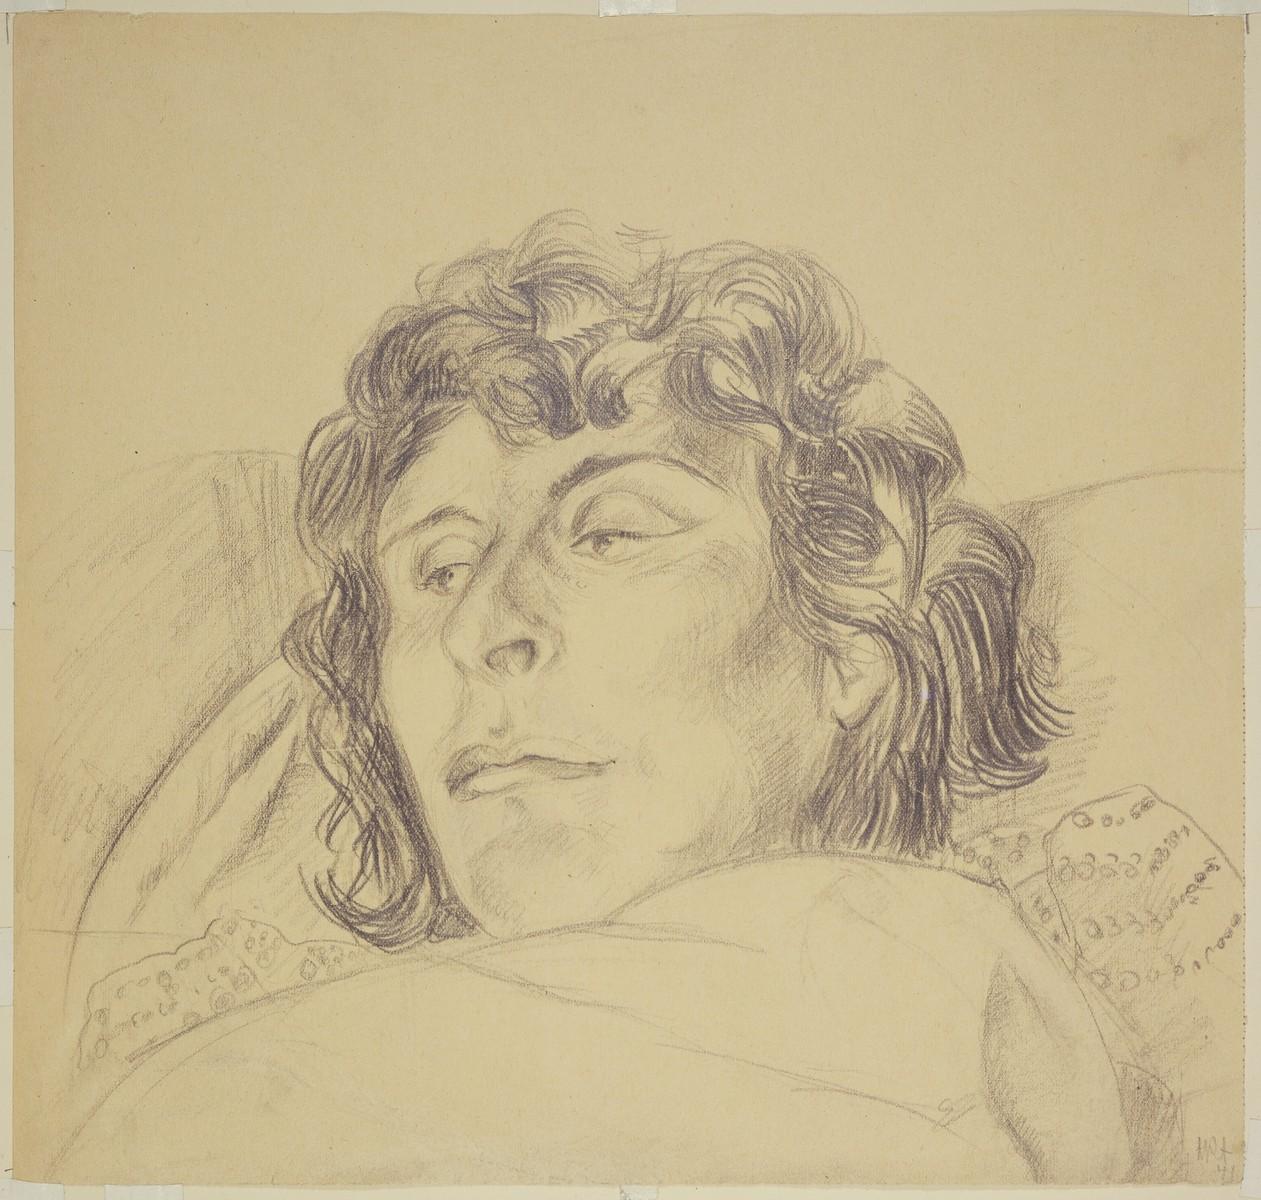 """Carlota Reifen (Markus)"" by Lili Andrieux."